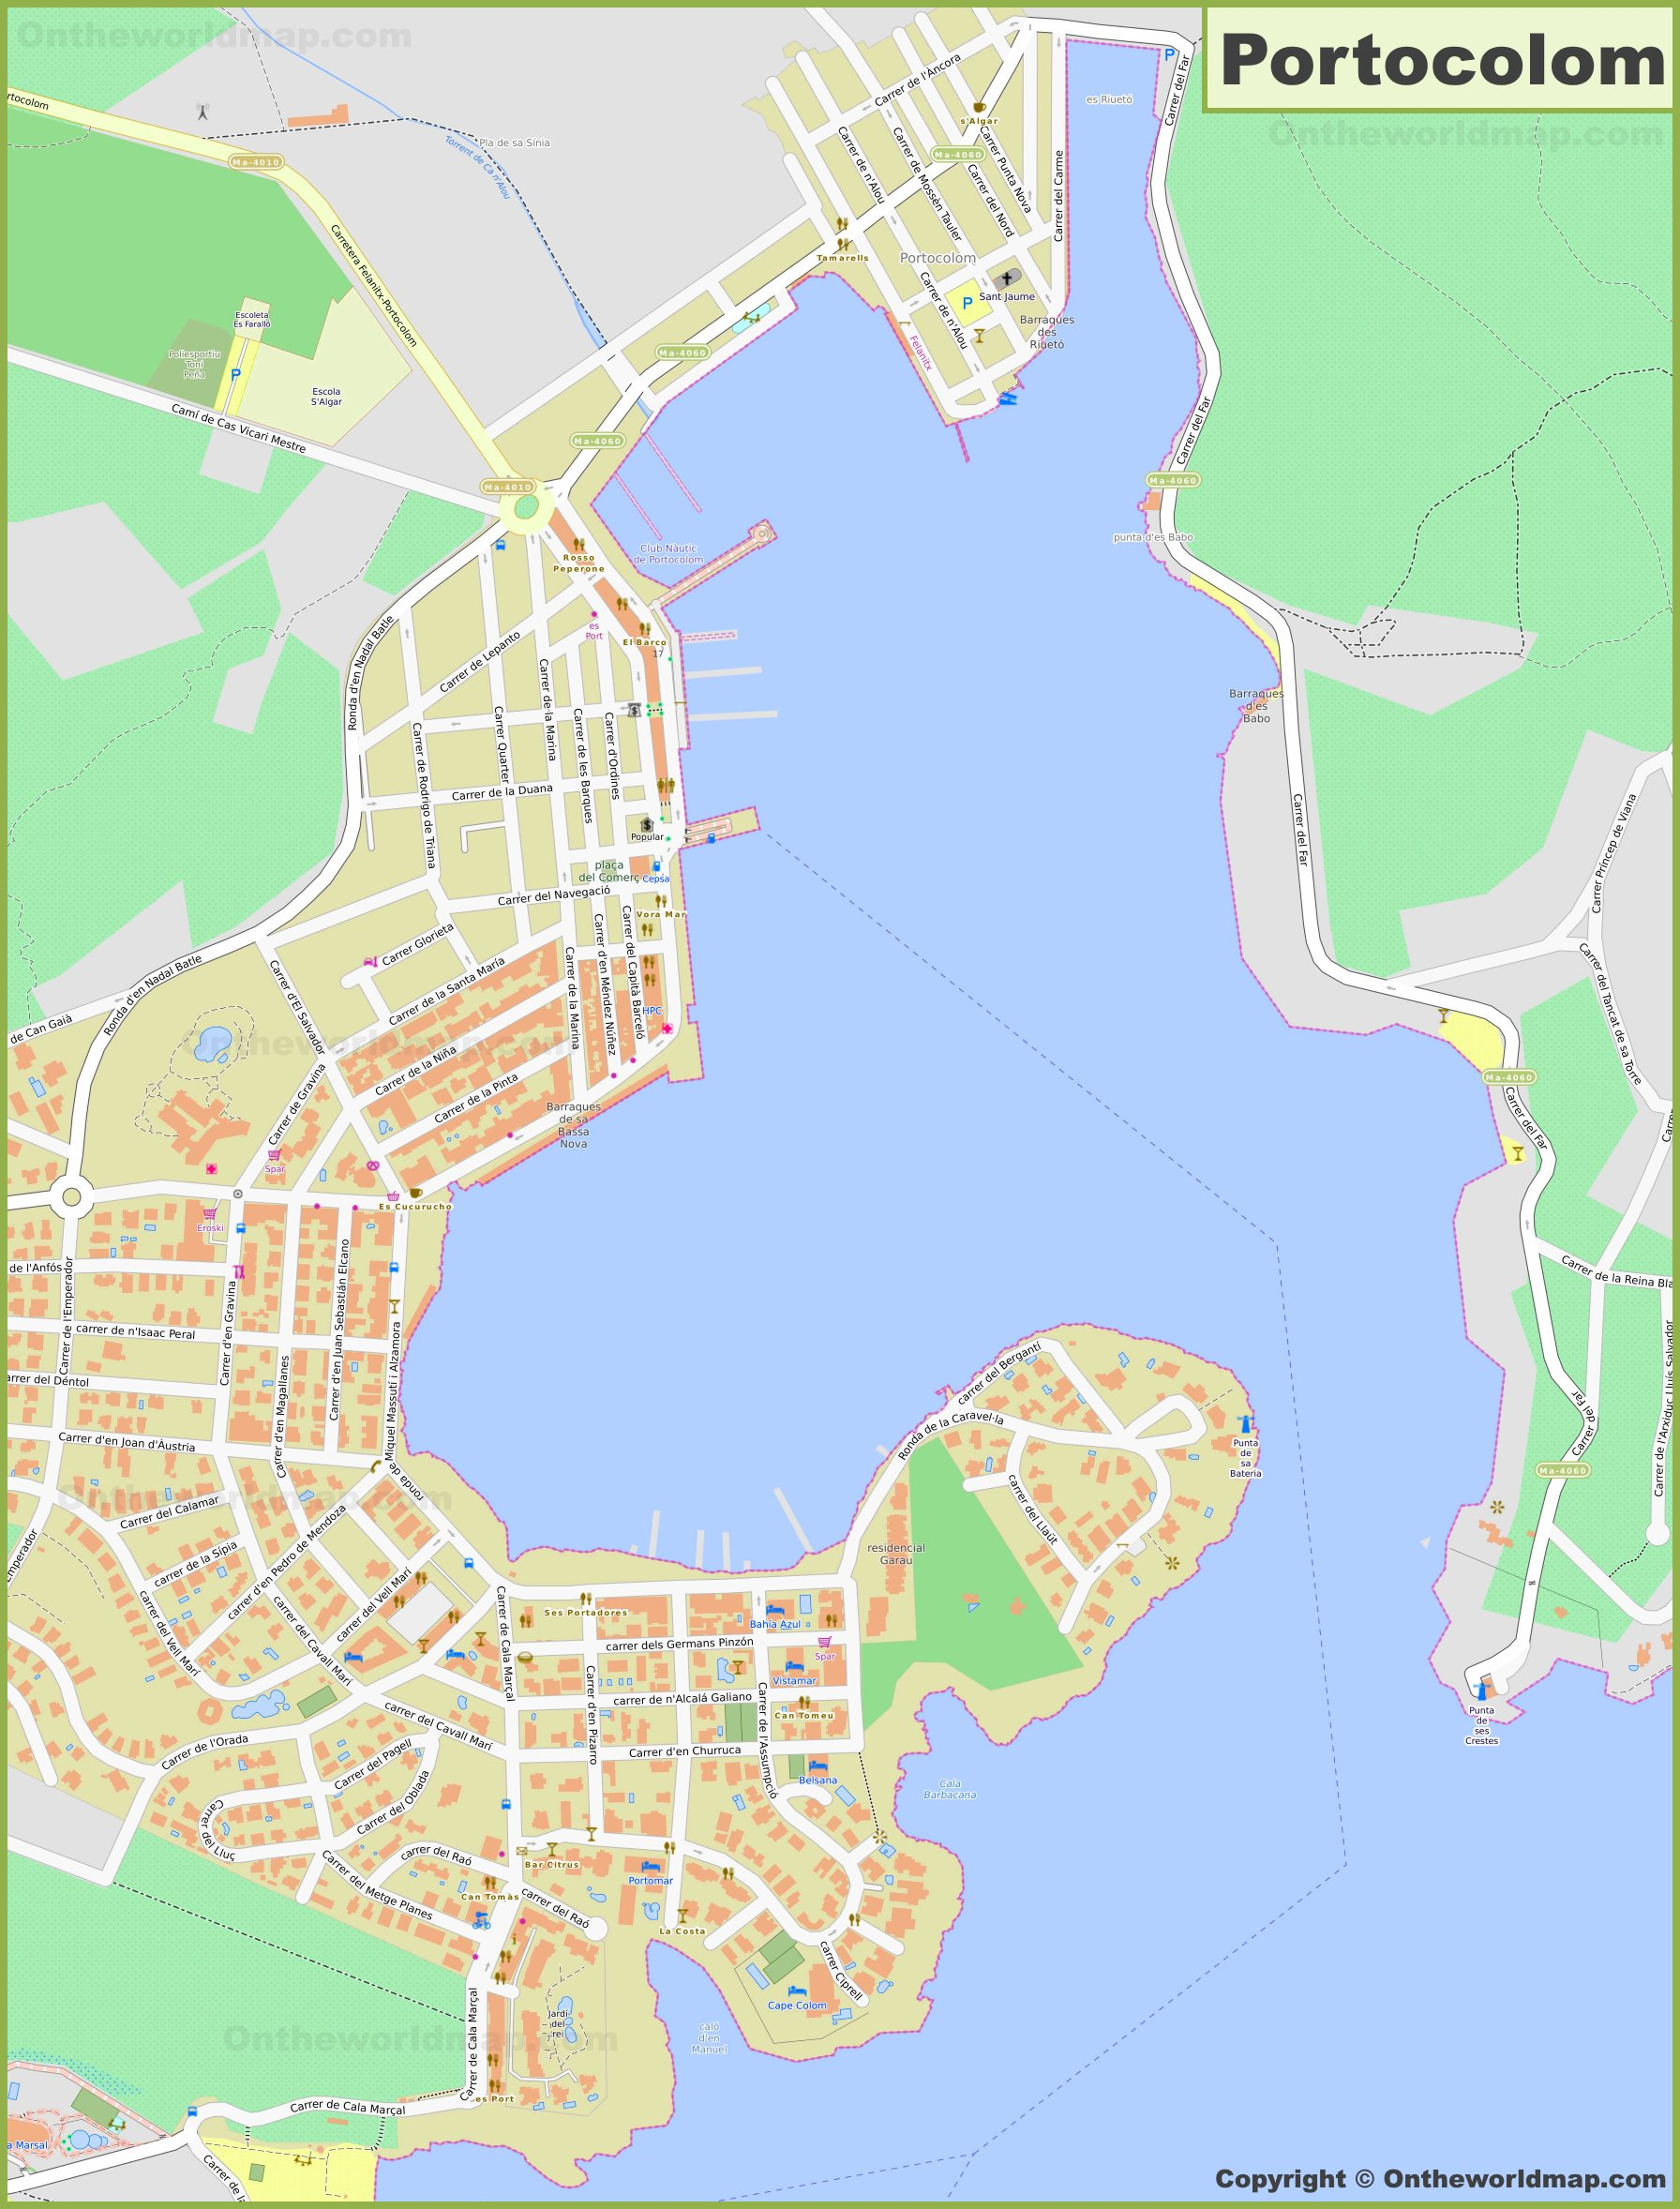 Detailed map of Portocolom